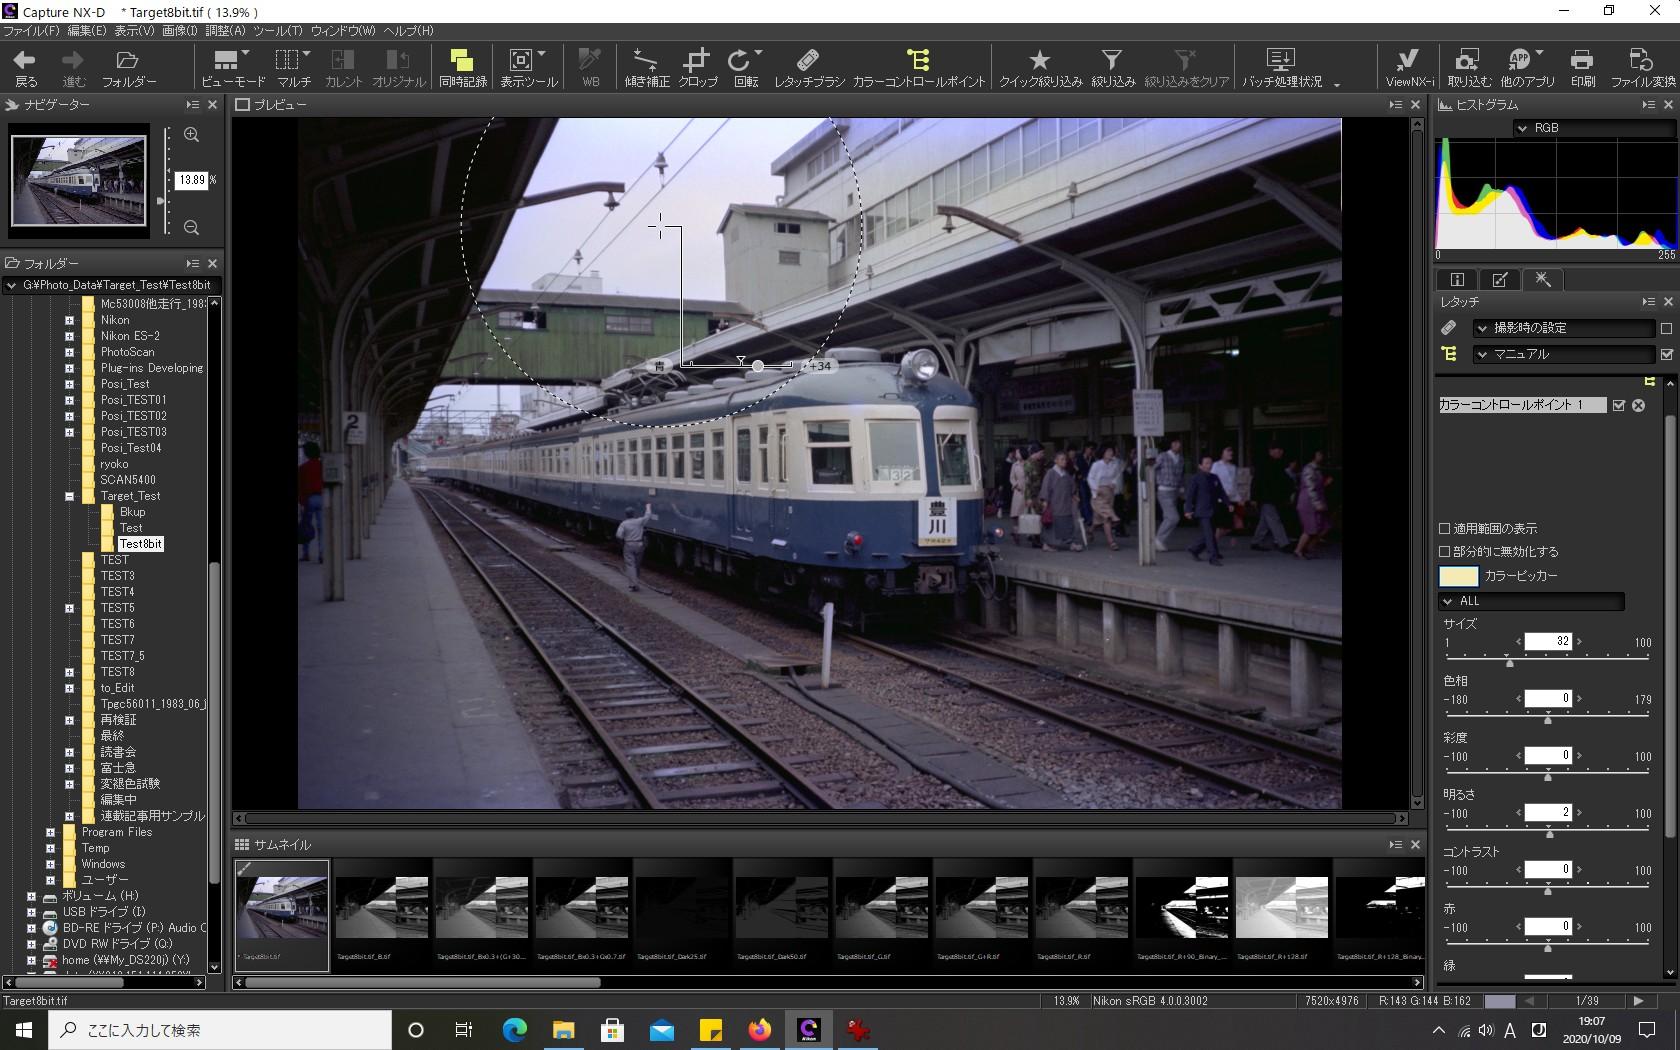 f:id:yasuo_ssi:20201009225707j:plain